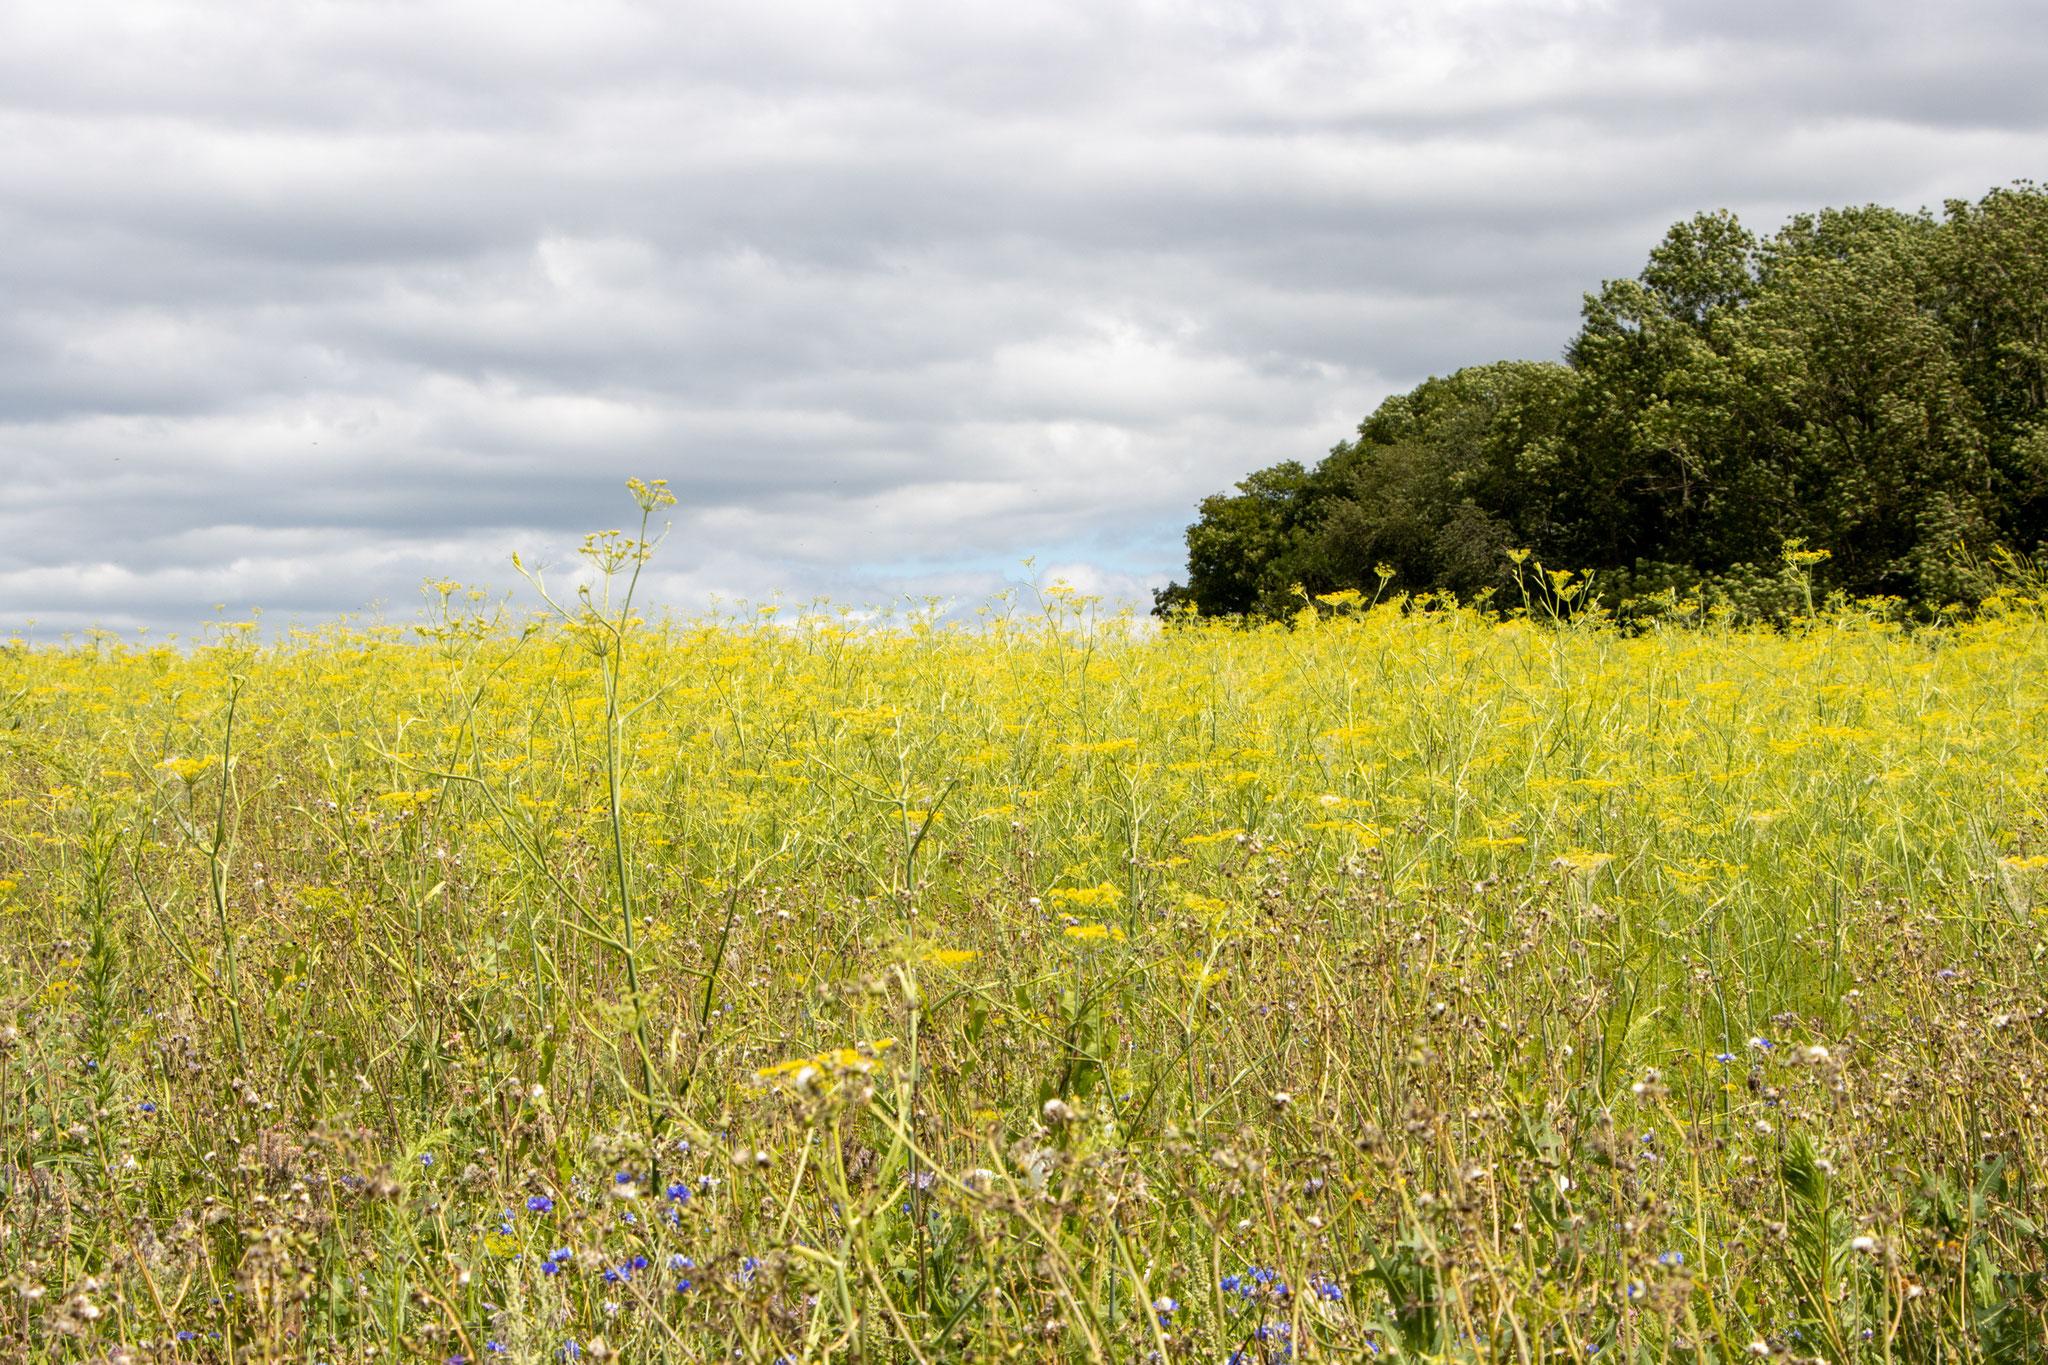 Ein riesiges Feld mit Fenchel (Foeniculum vulgare) (HB)